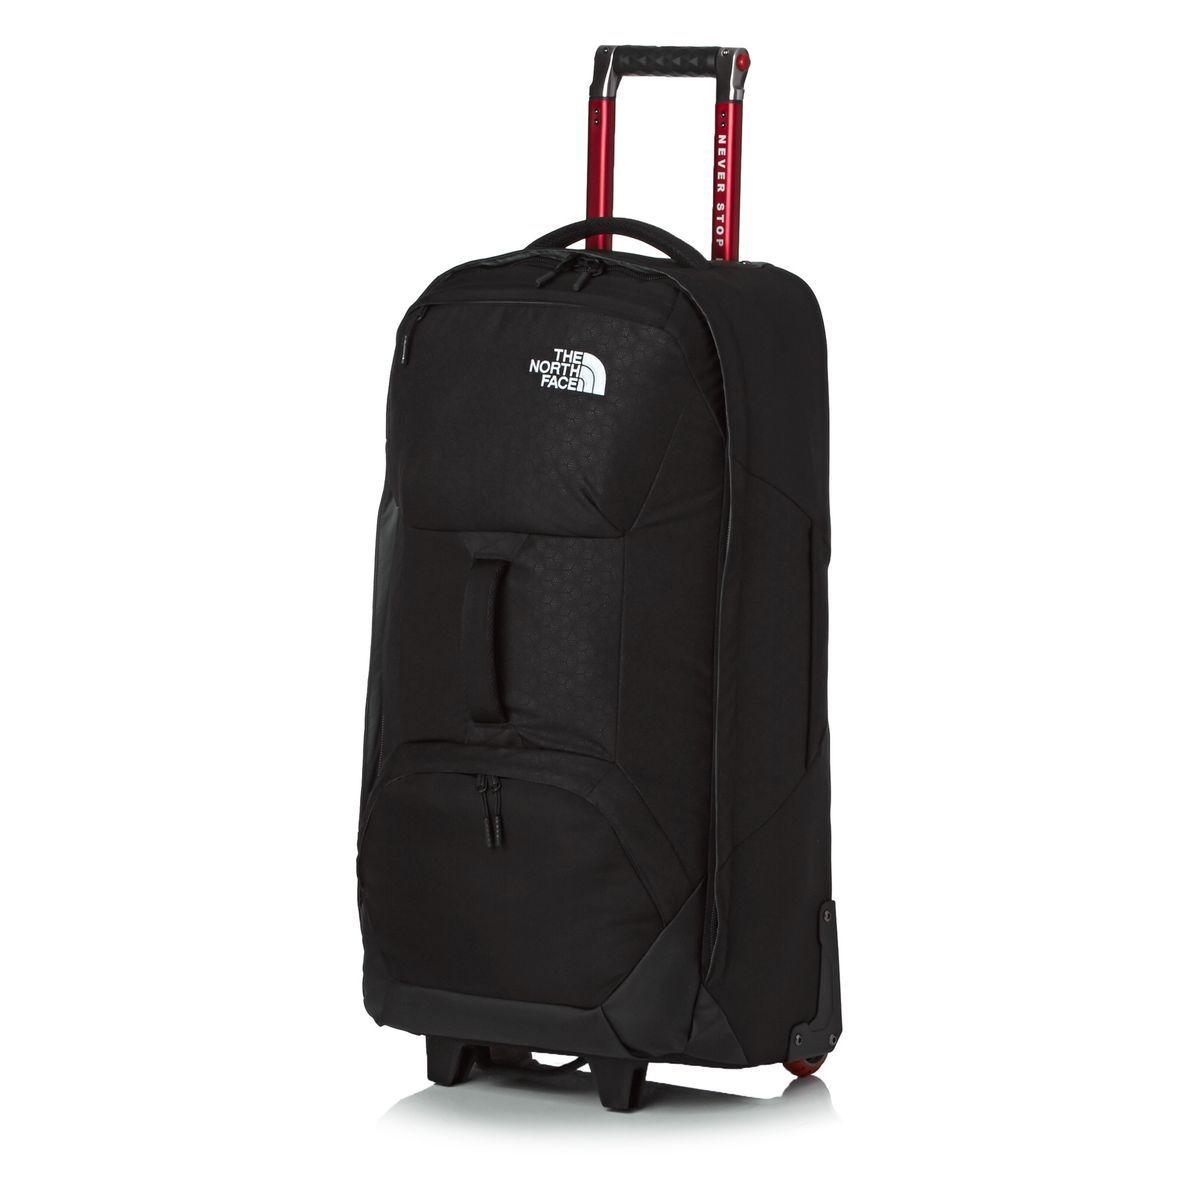 b53482776 North Face Longhaul 30 Luggage | My Surfdome Christmas Wish List ...